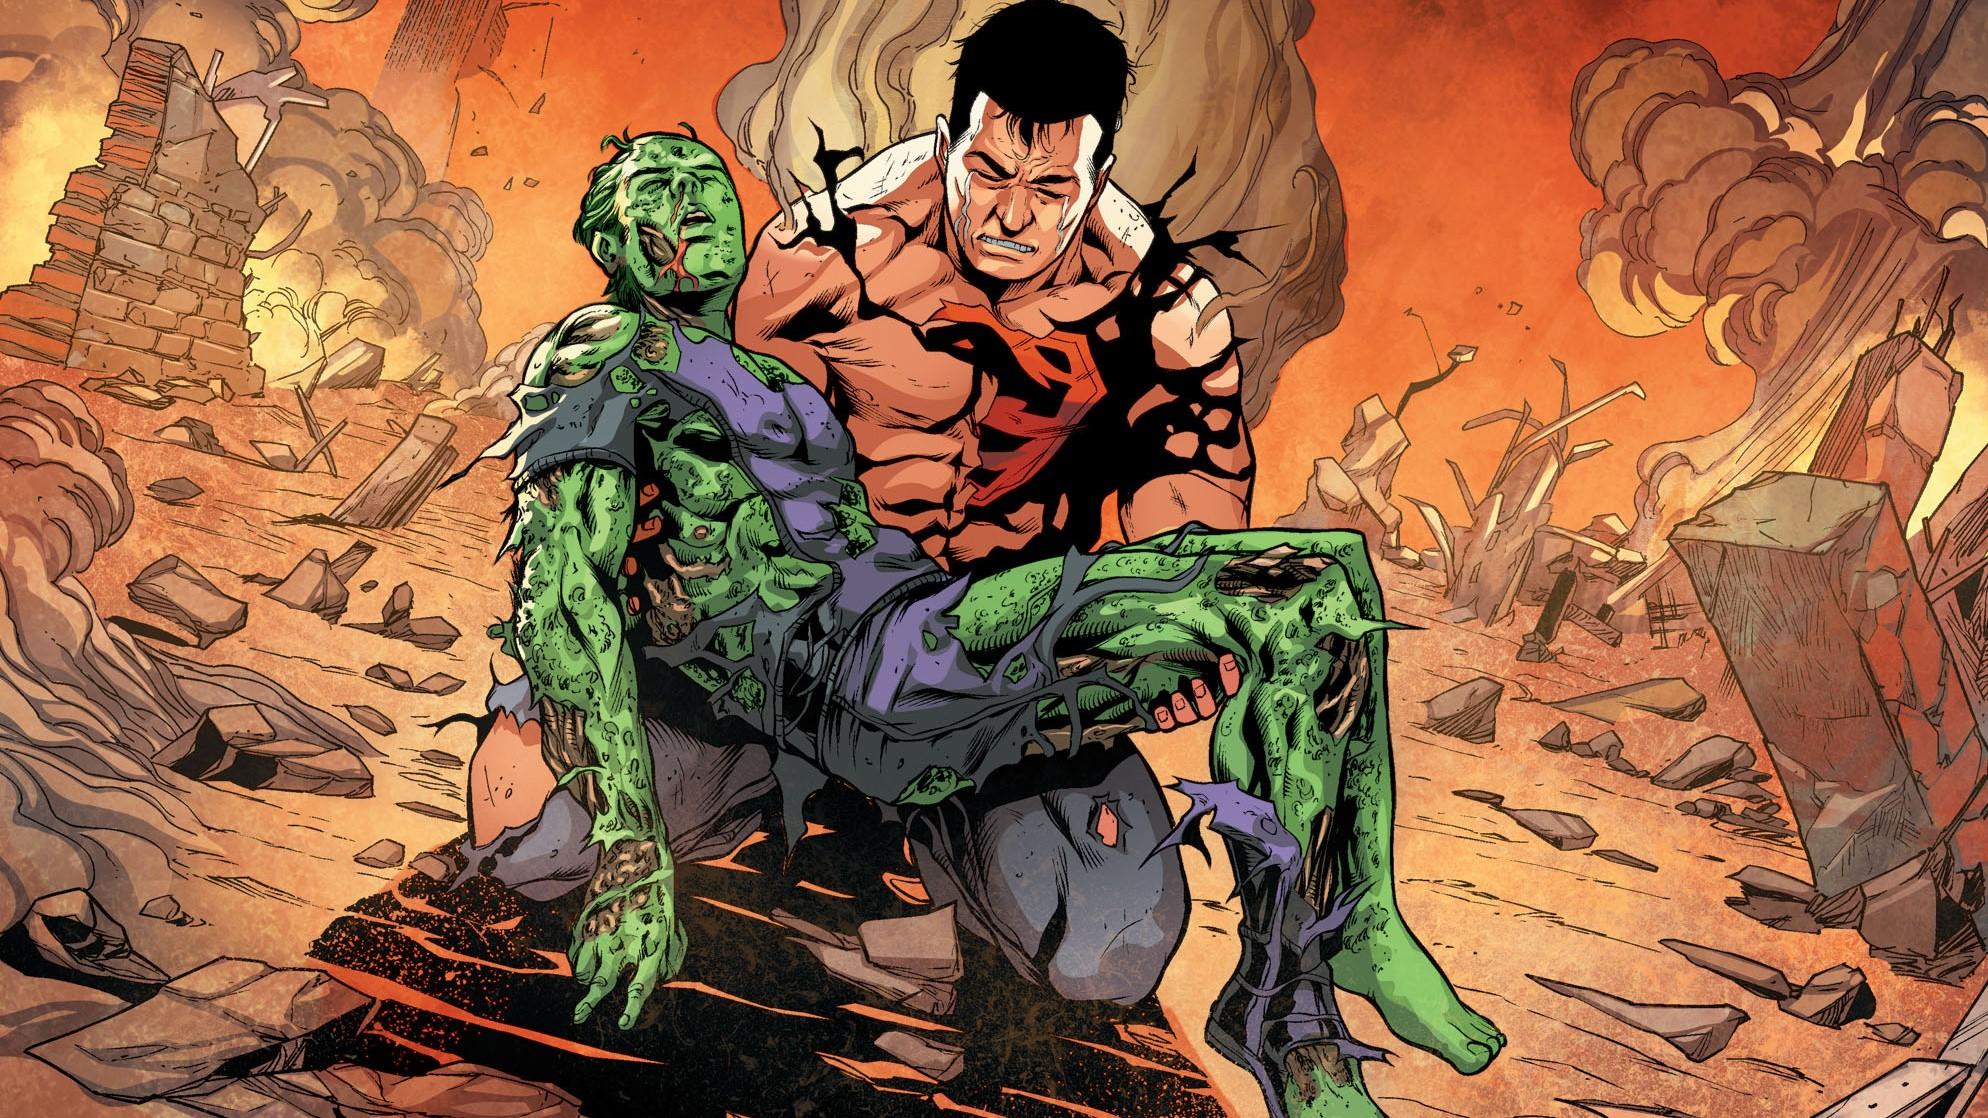 Anime 1988x1118 Injustice 2 DC Comics DC Universe Beast Boy